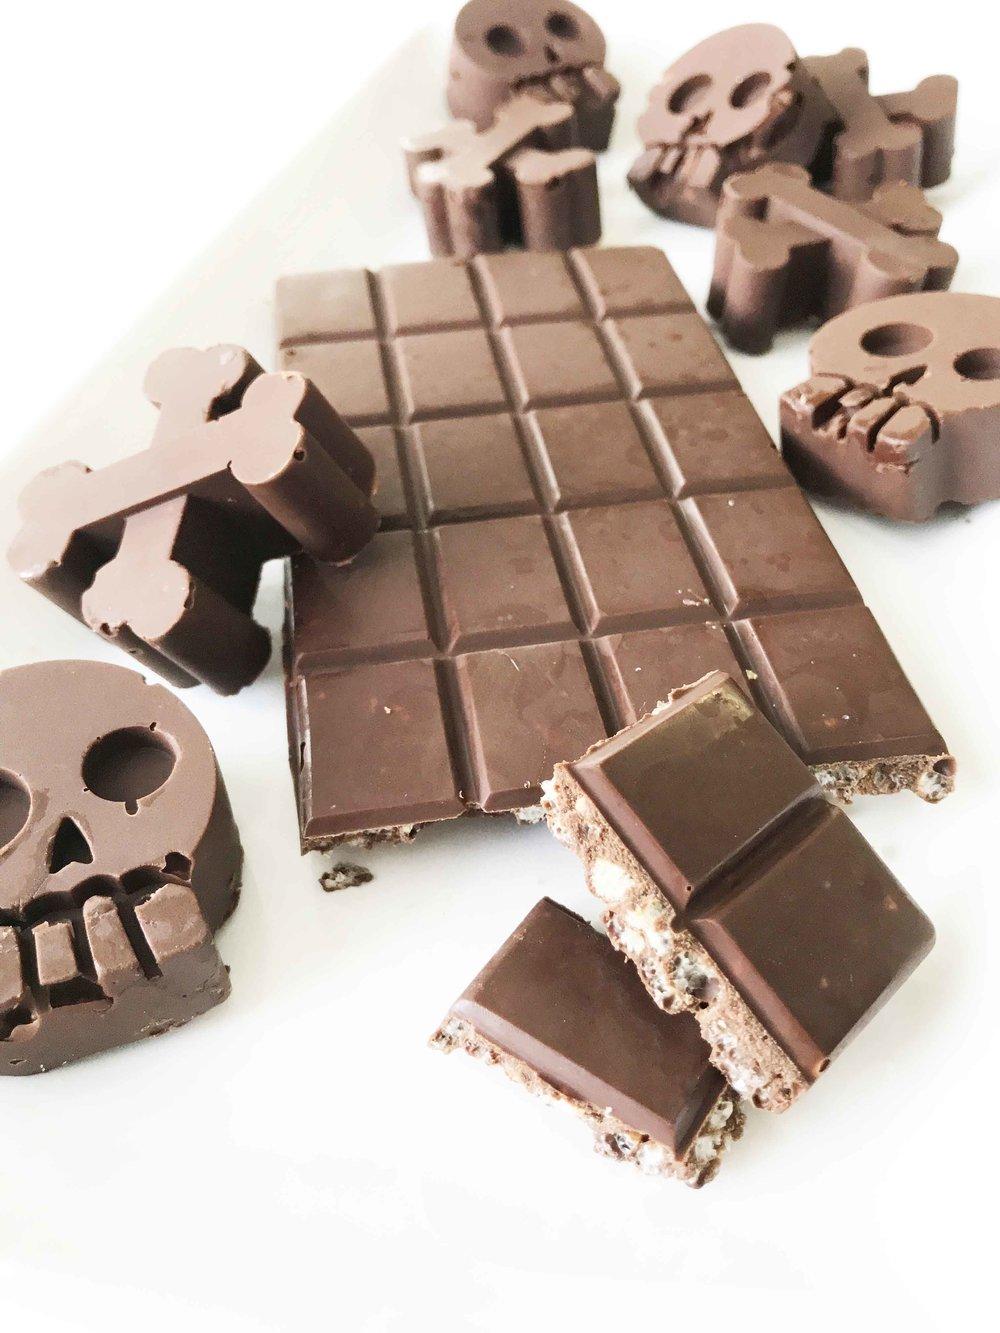 crispy-chocolate5.jpg